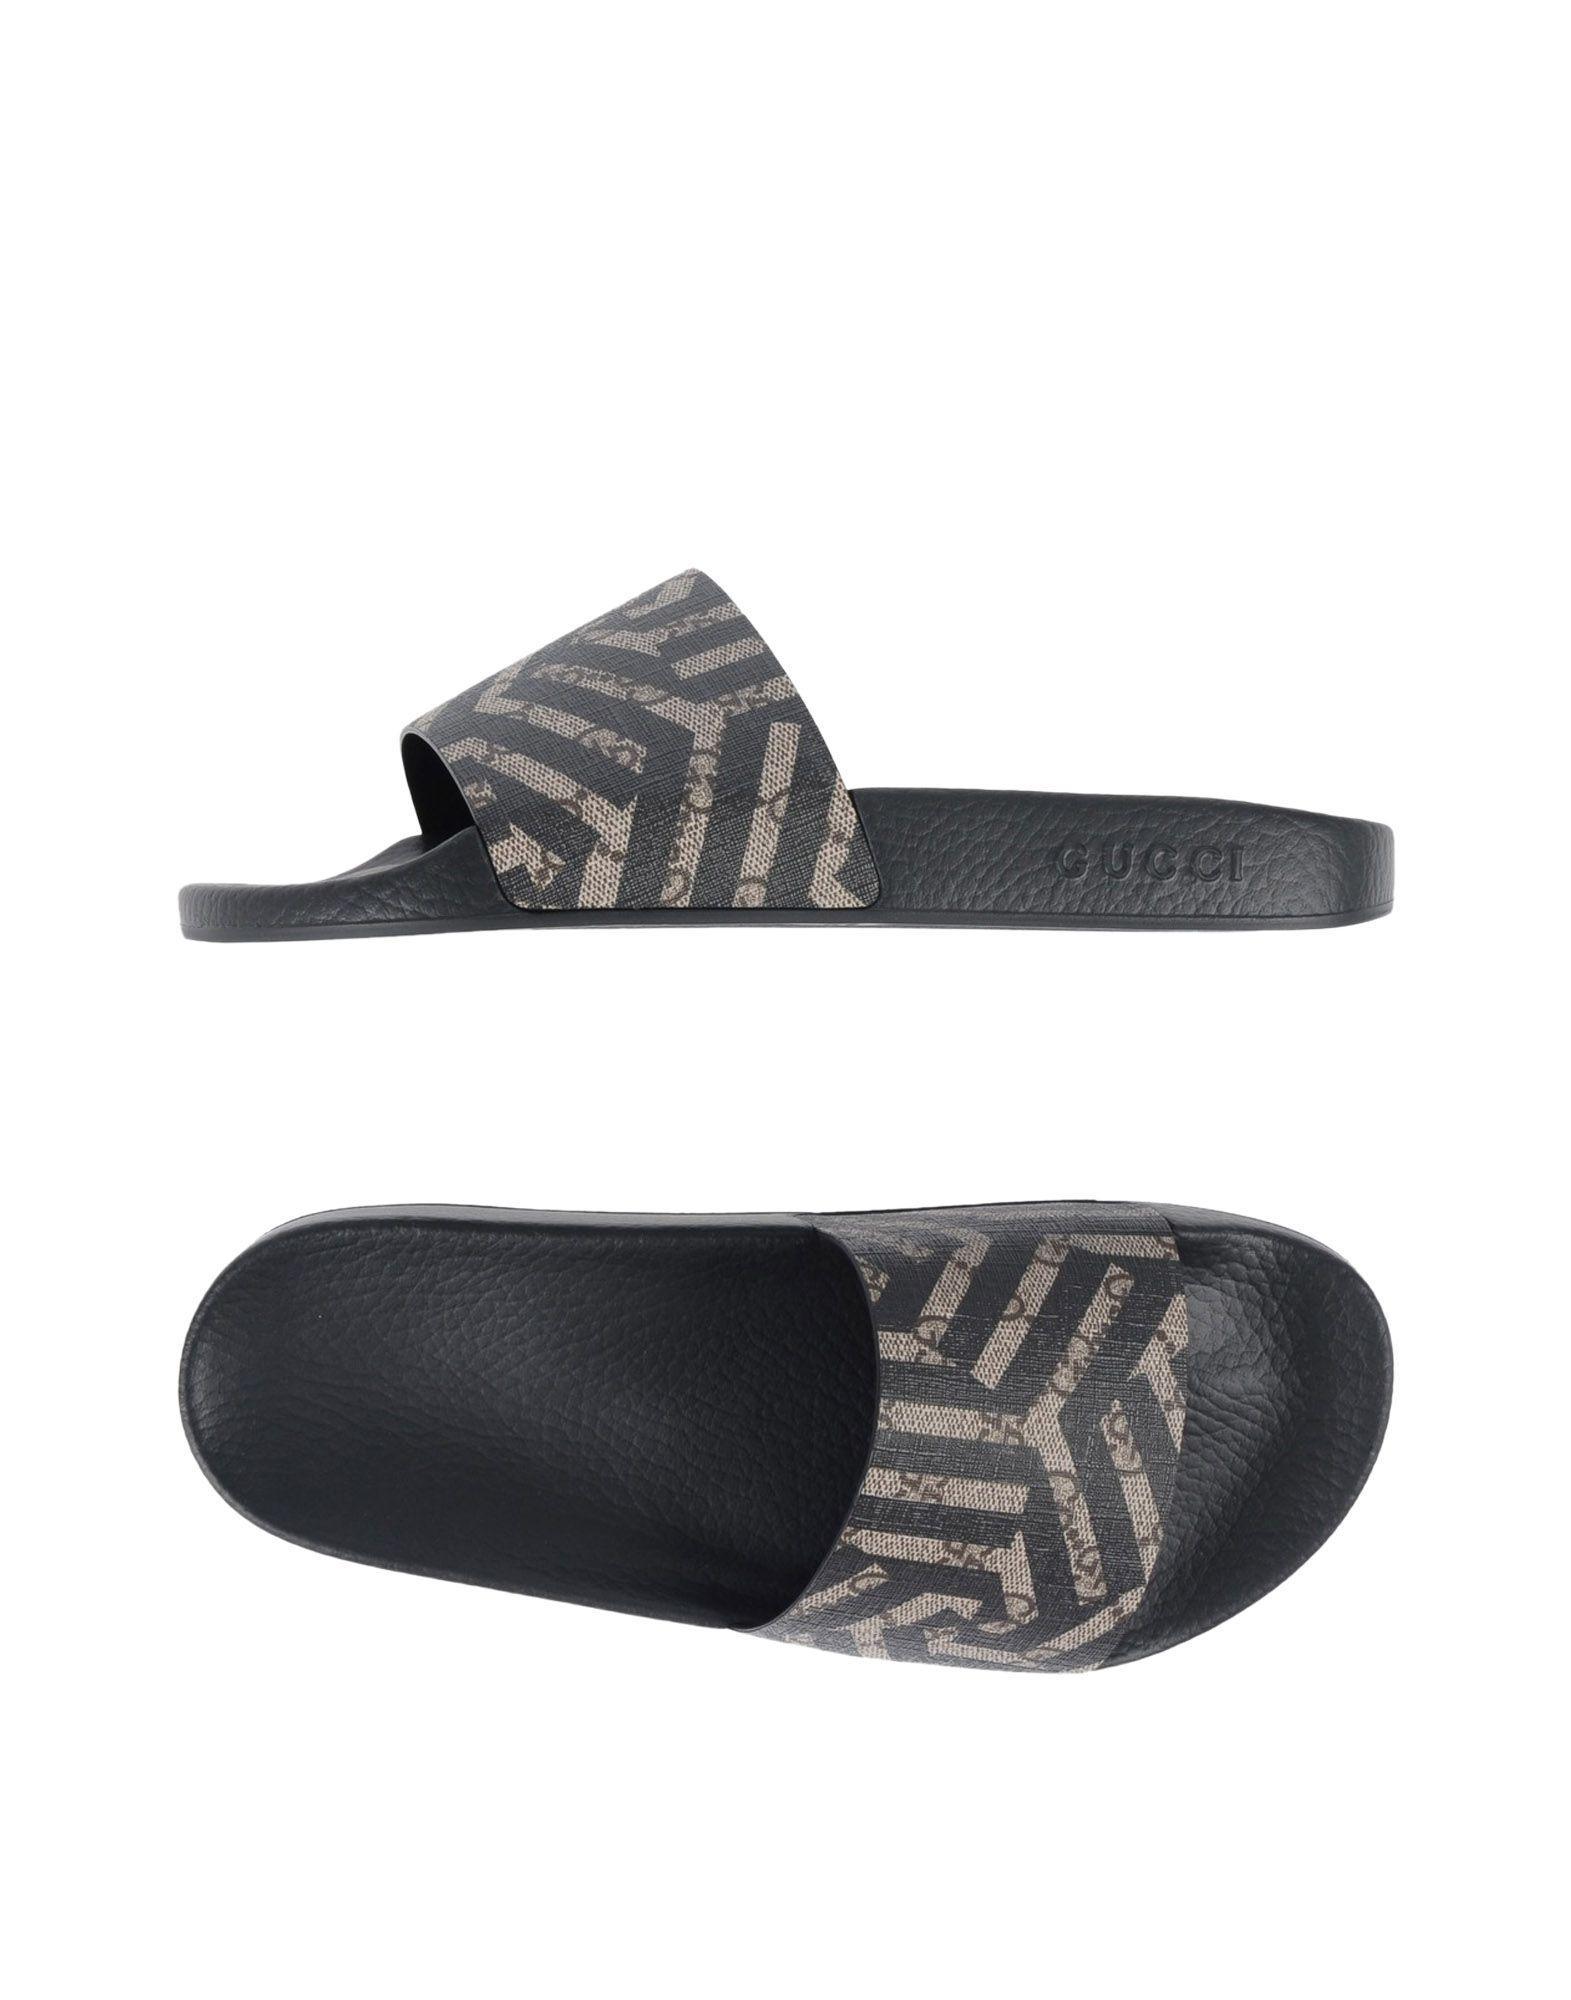 Gucci Sandals In Black